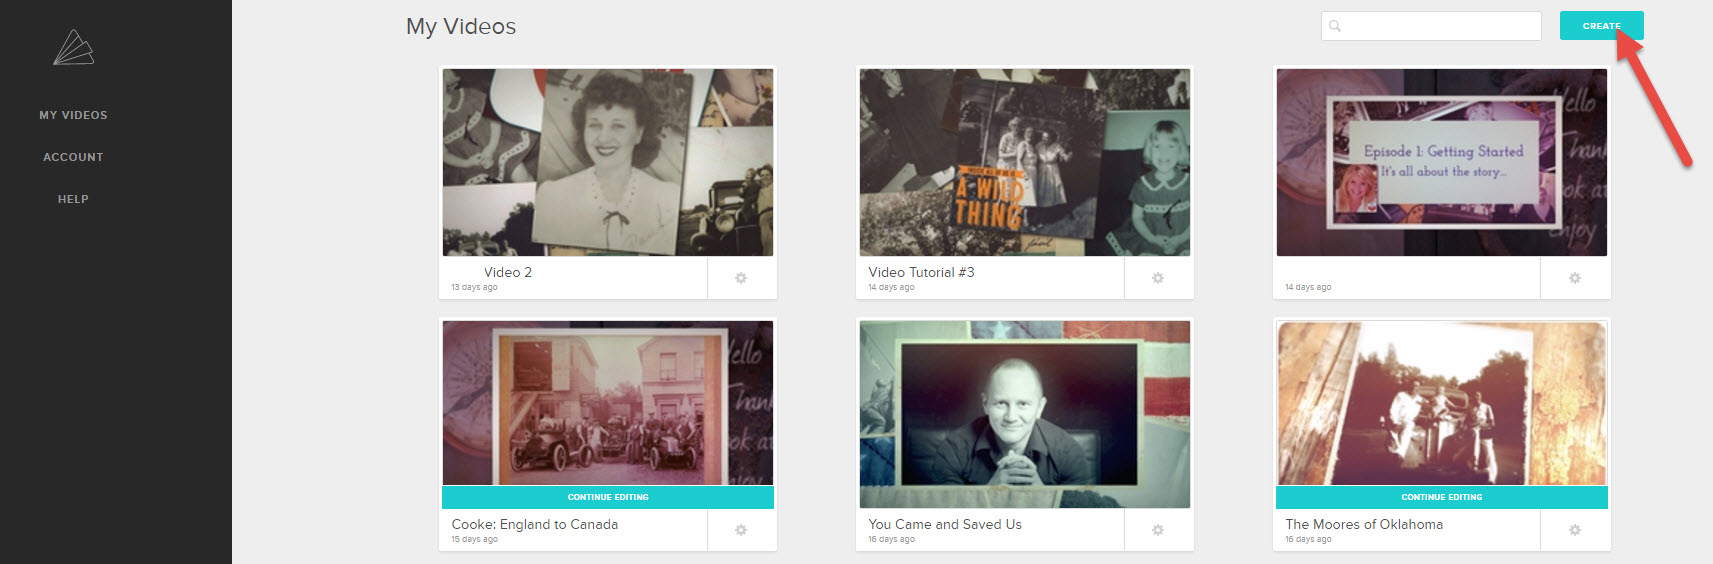 create family history videos